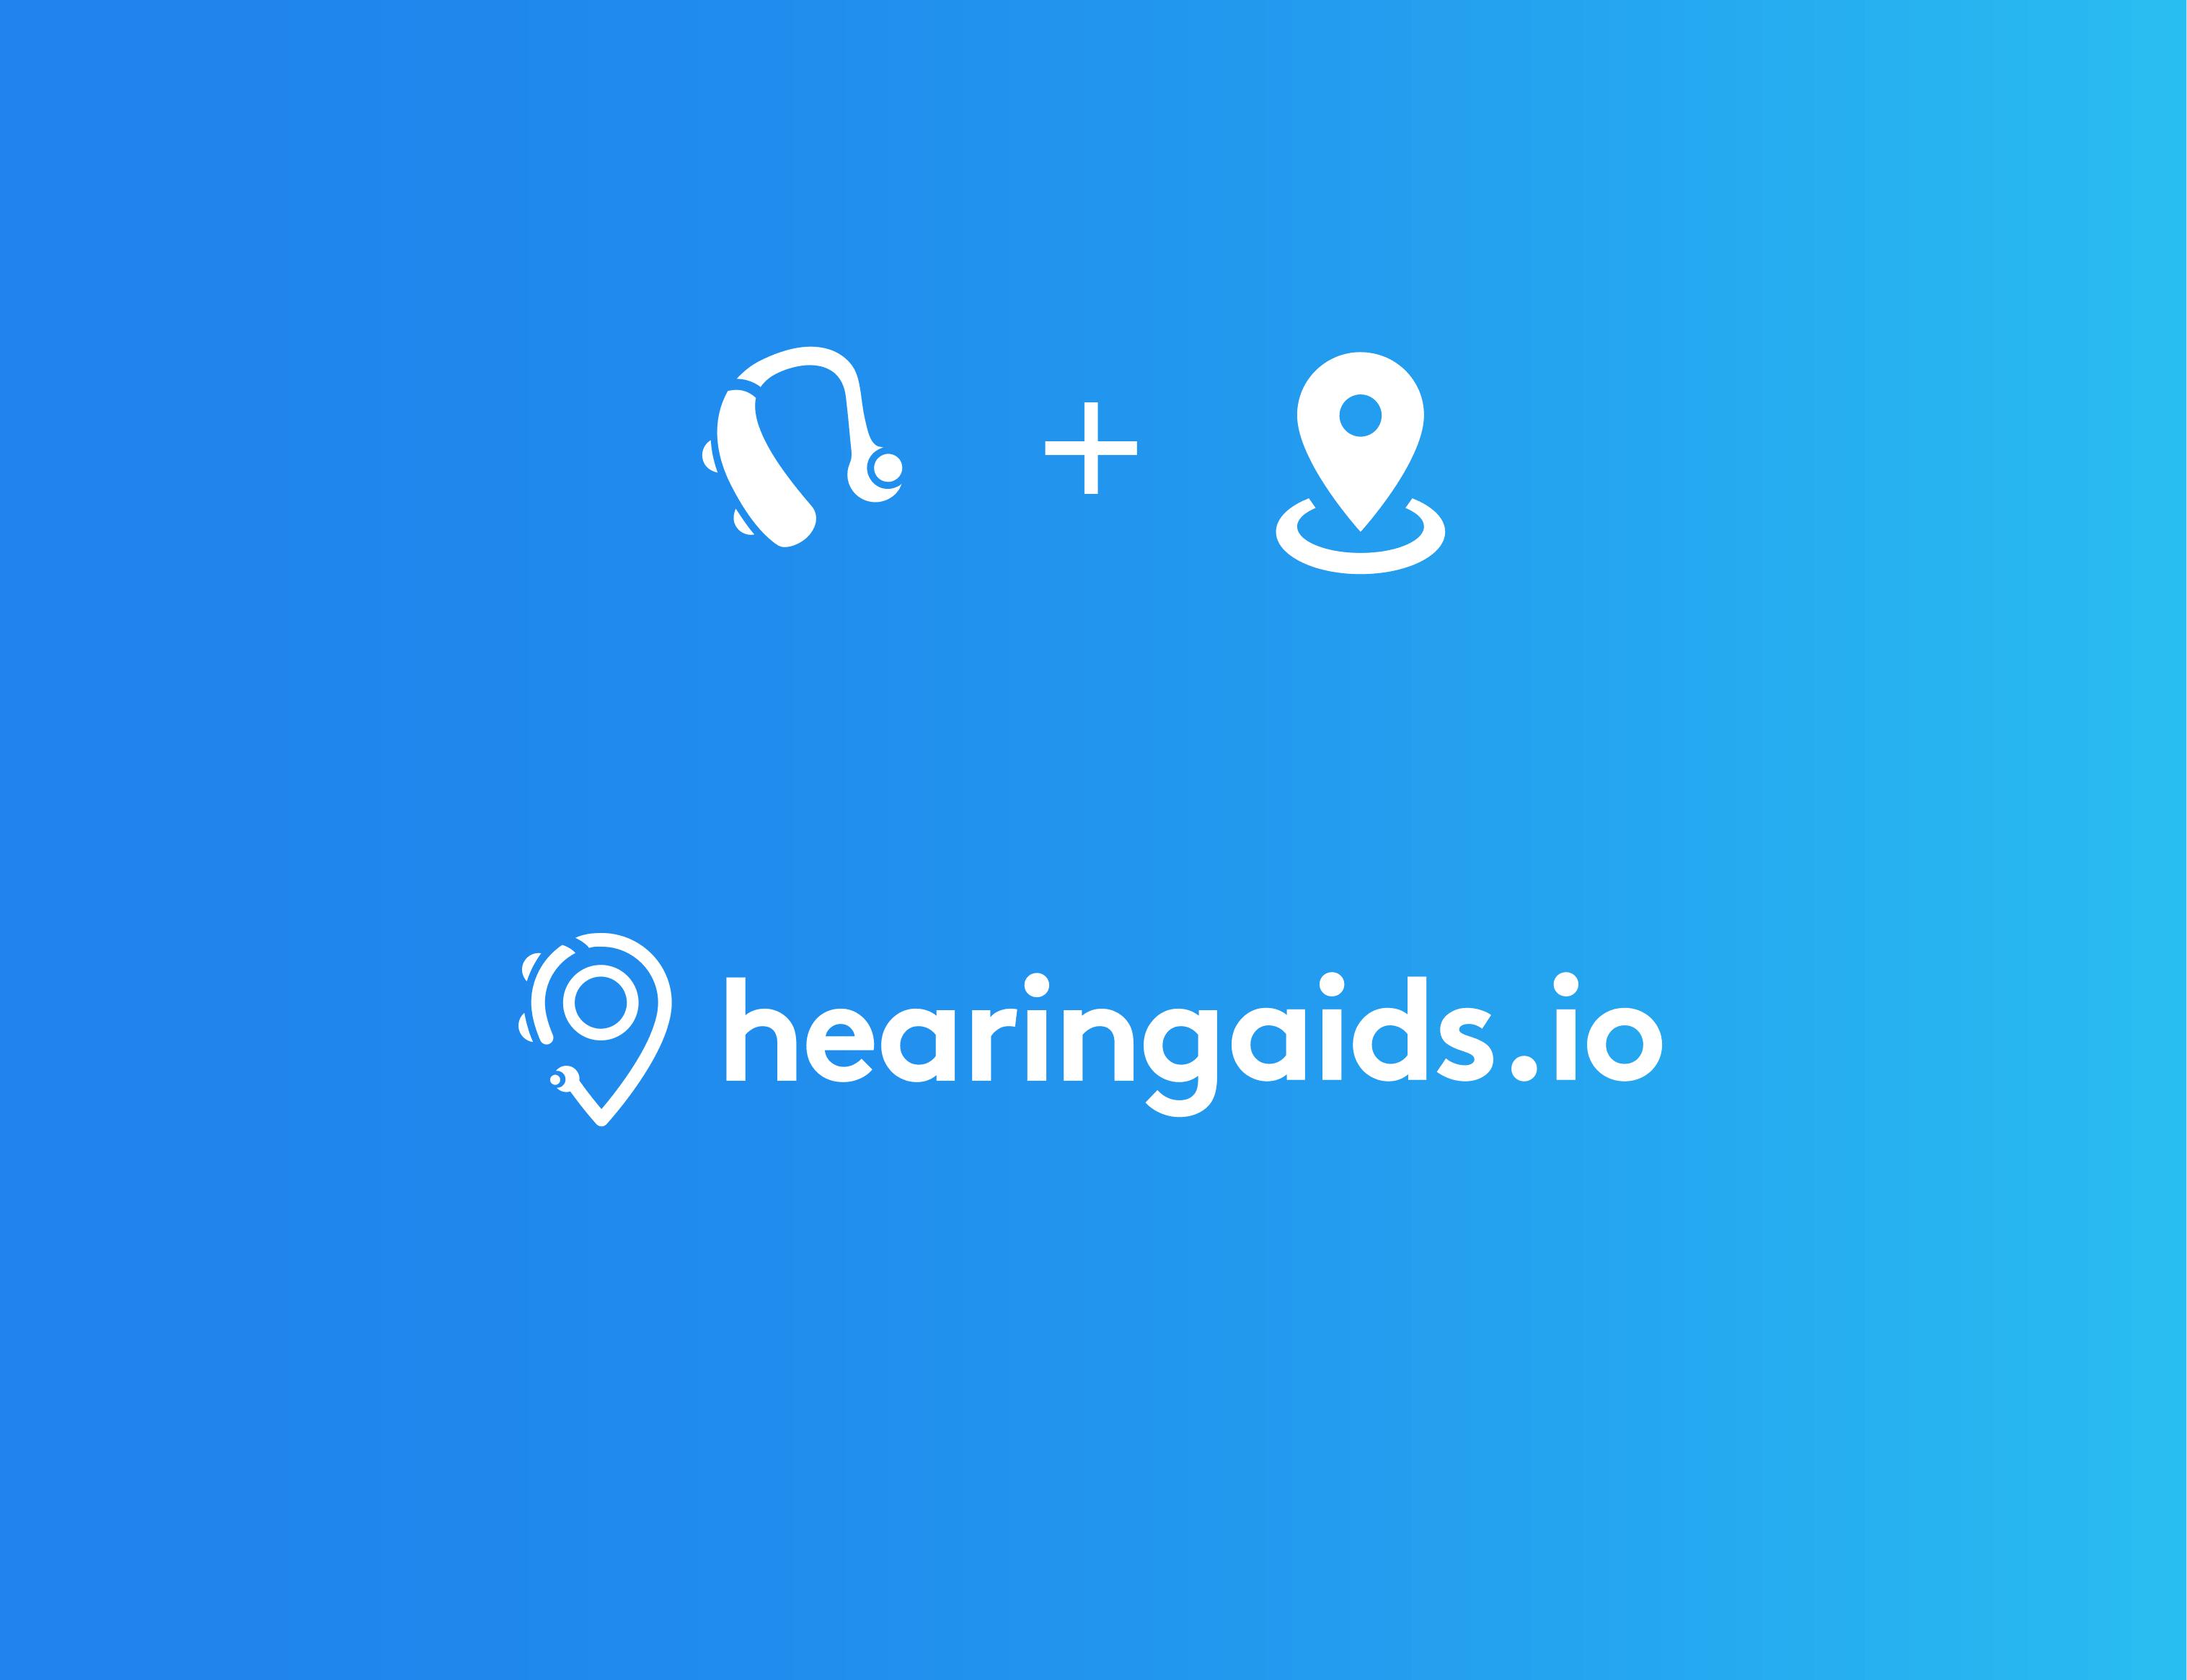 HearingAids.io